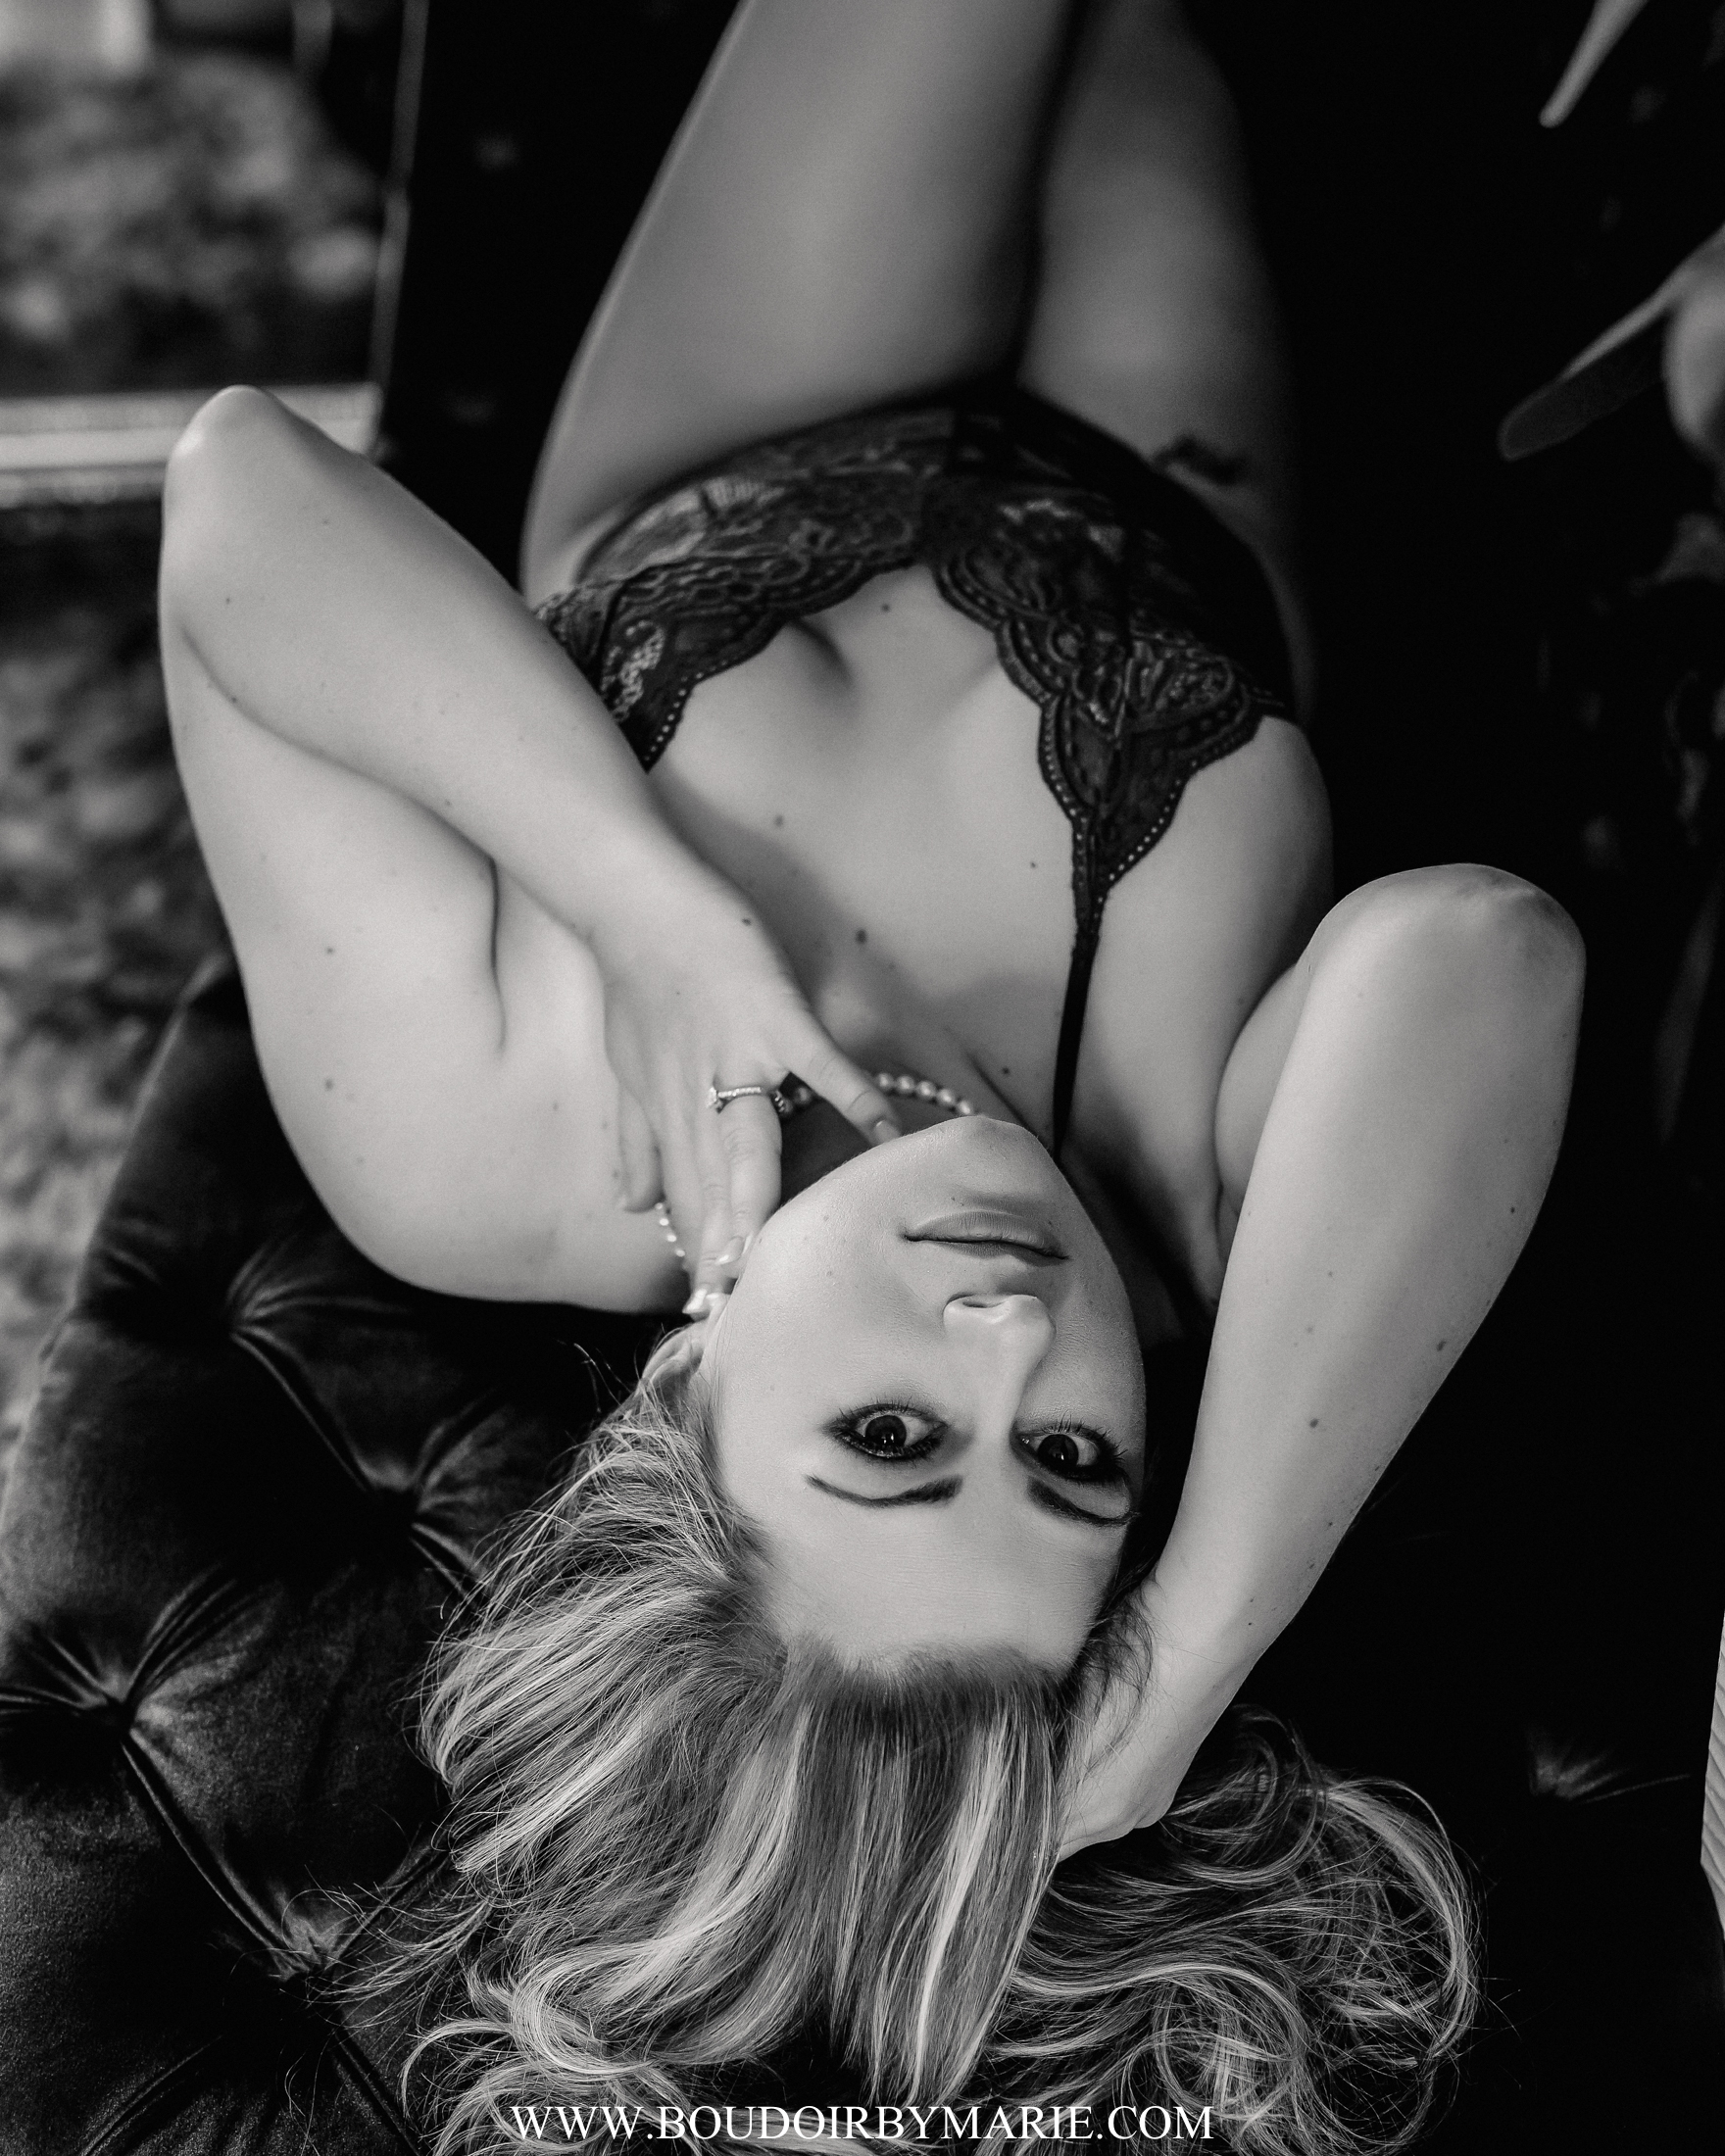 BoudoirbyMarie-Photography-7.jpg